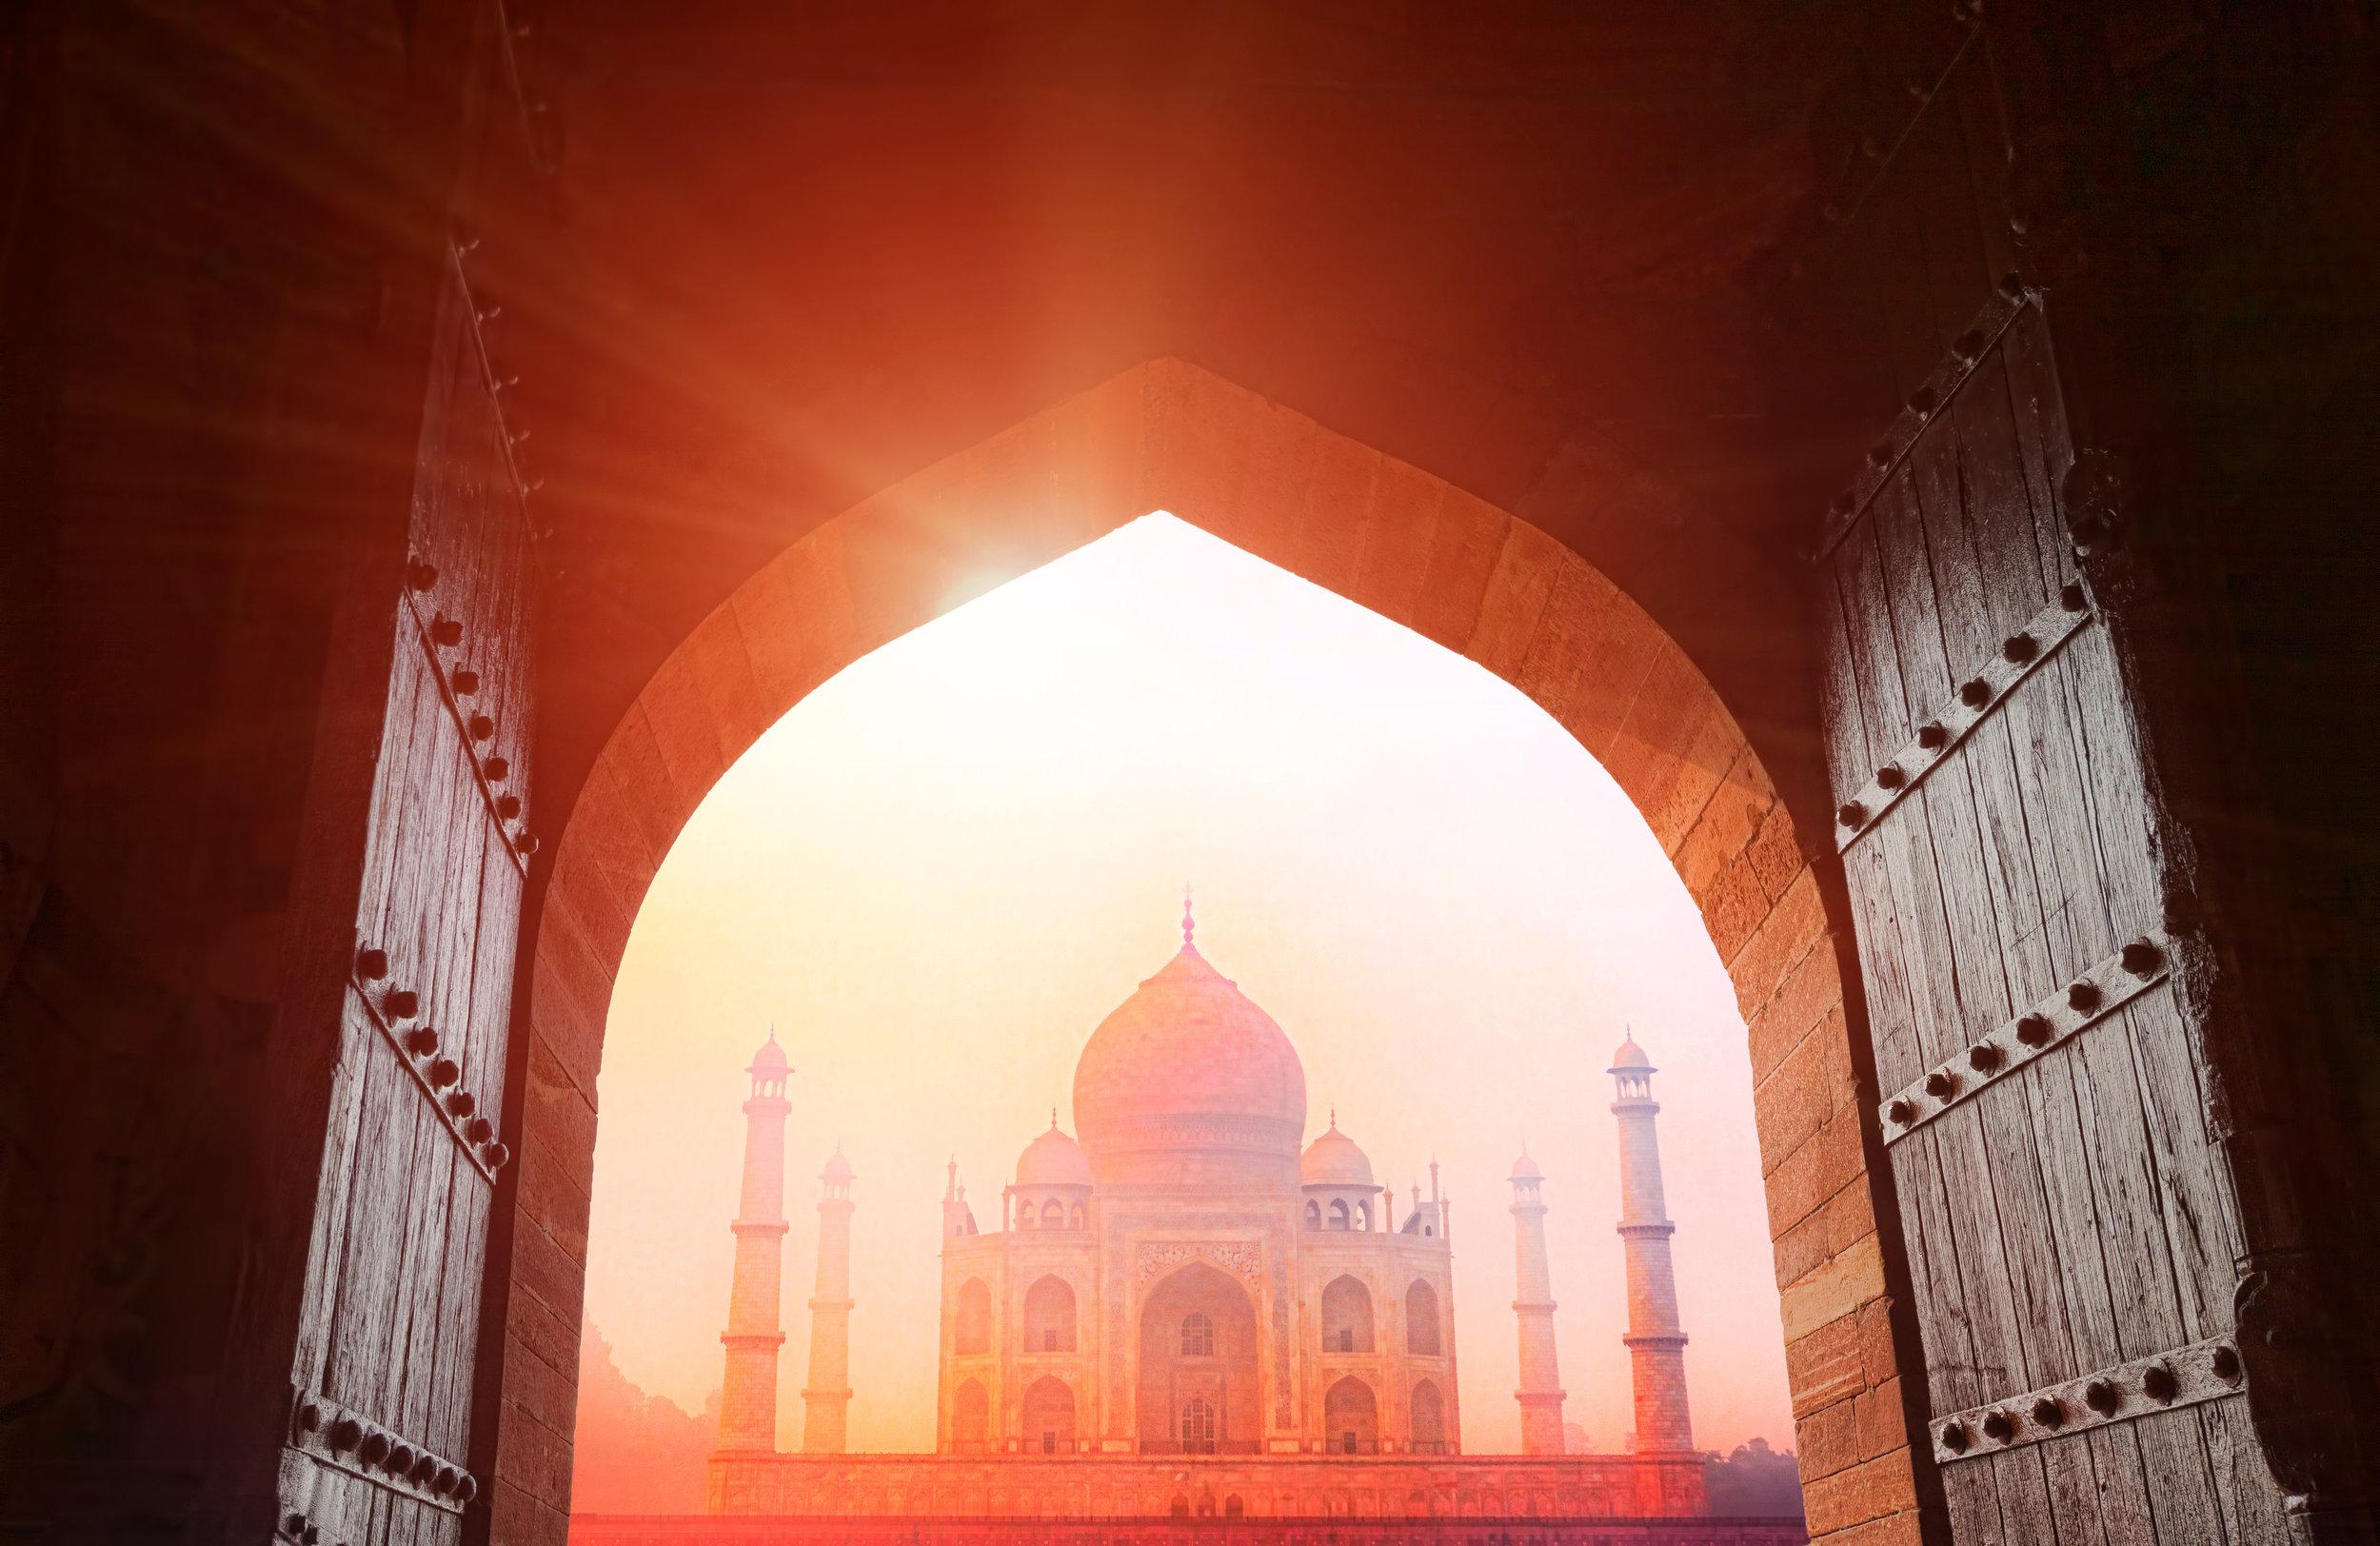 bigstock-Taj-Mahal-In-The-Sunlight-43225129.jpg